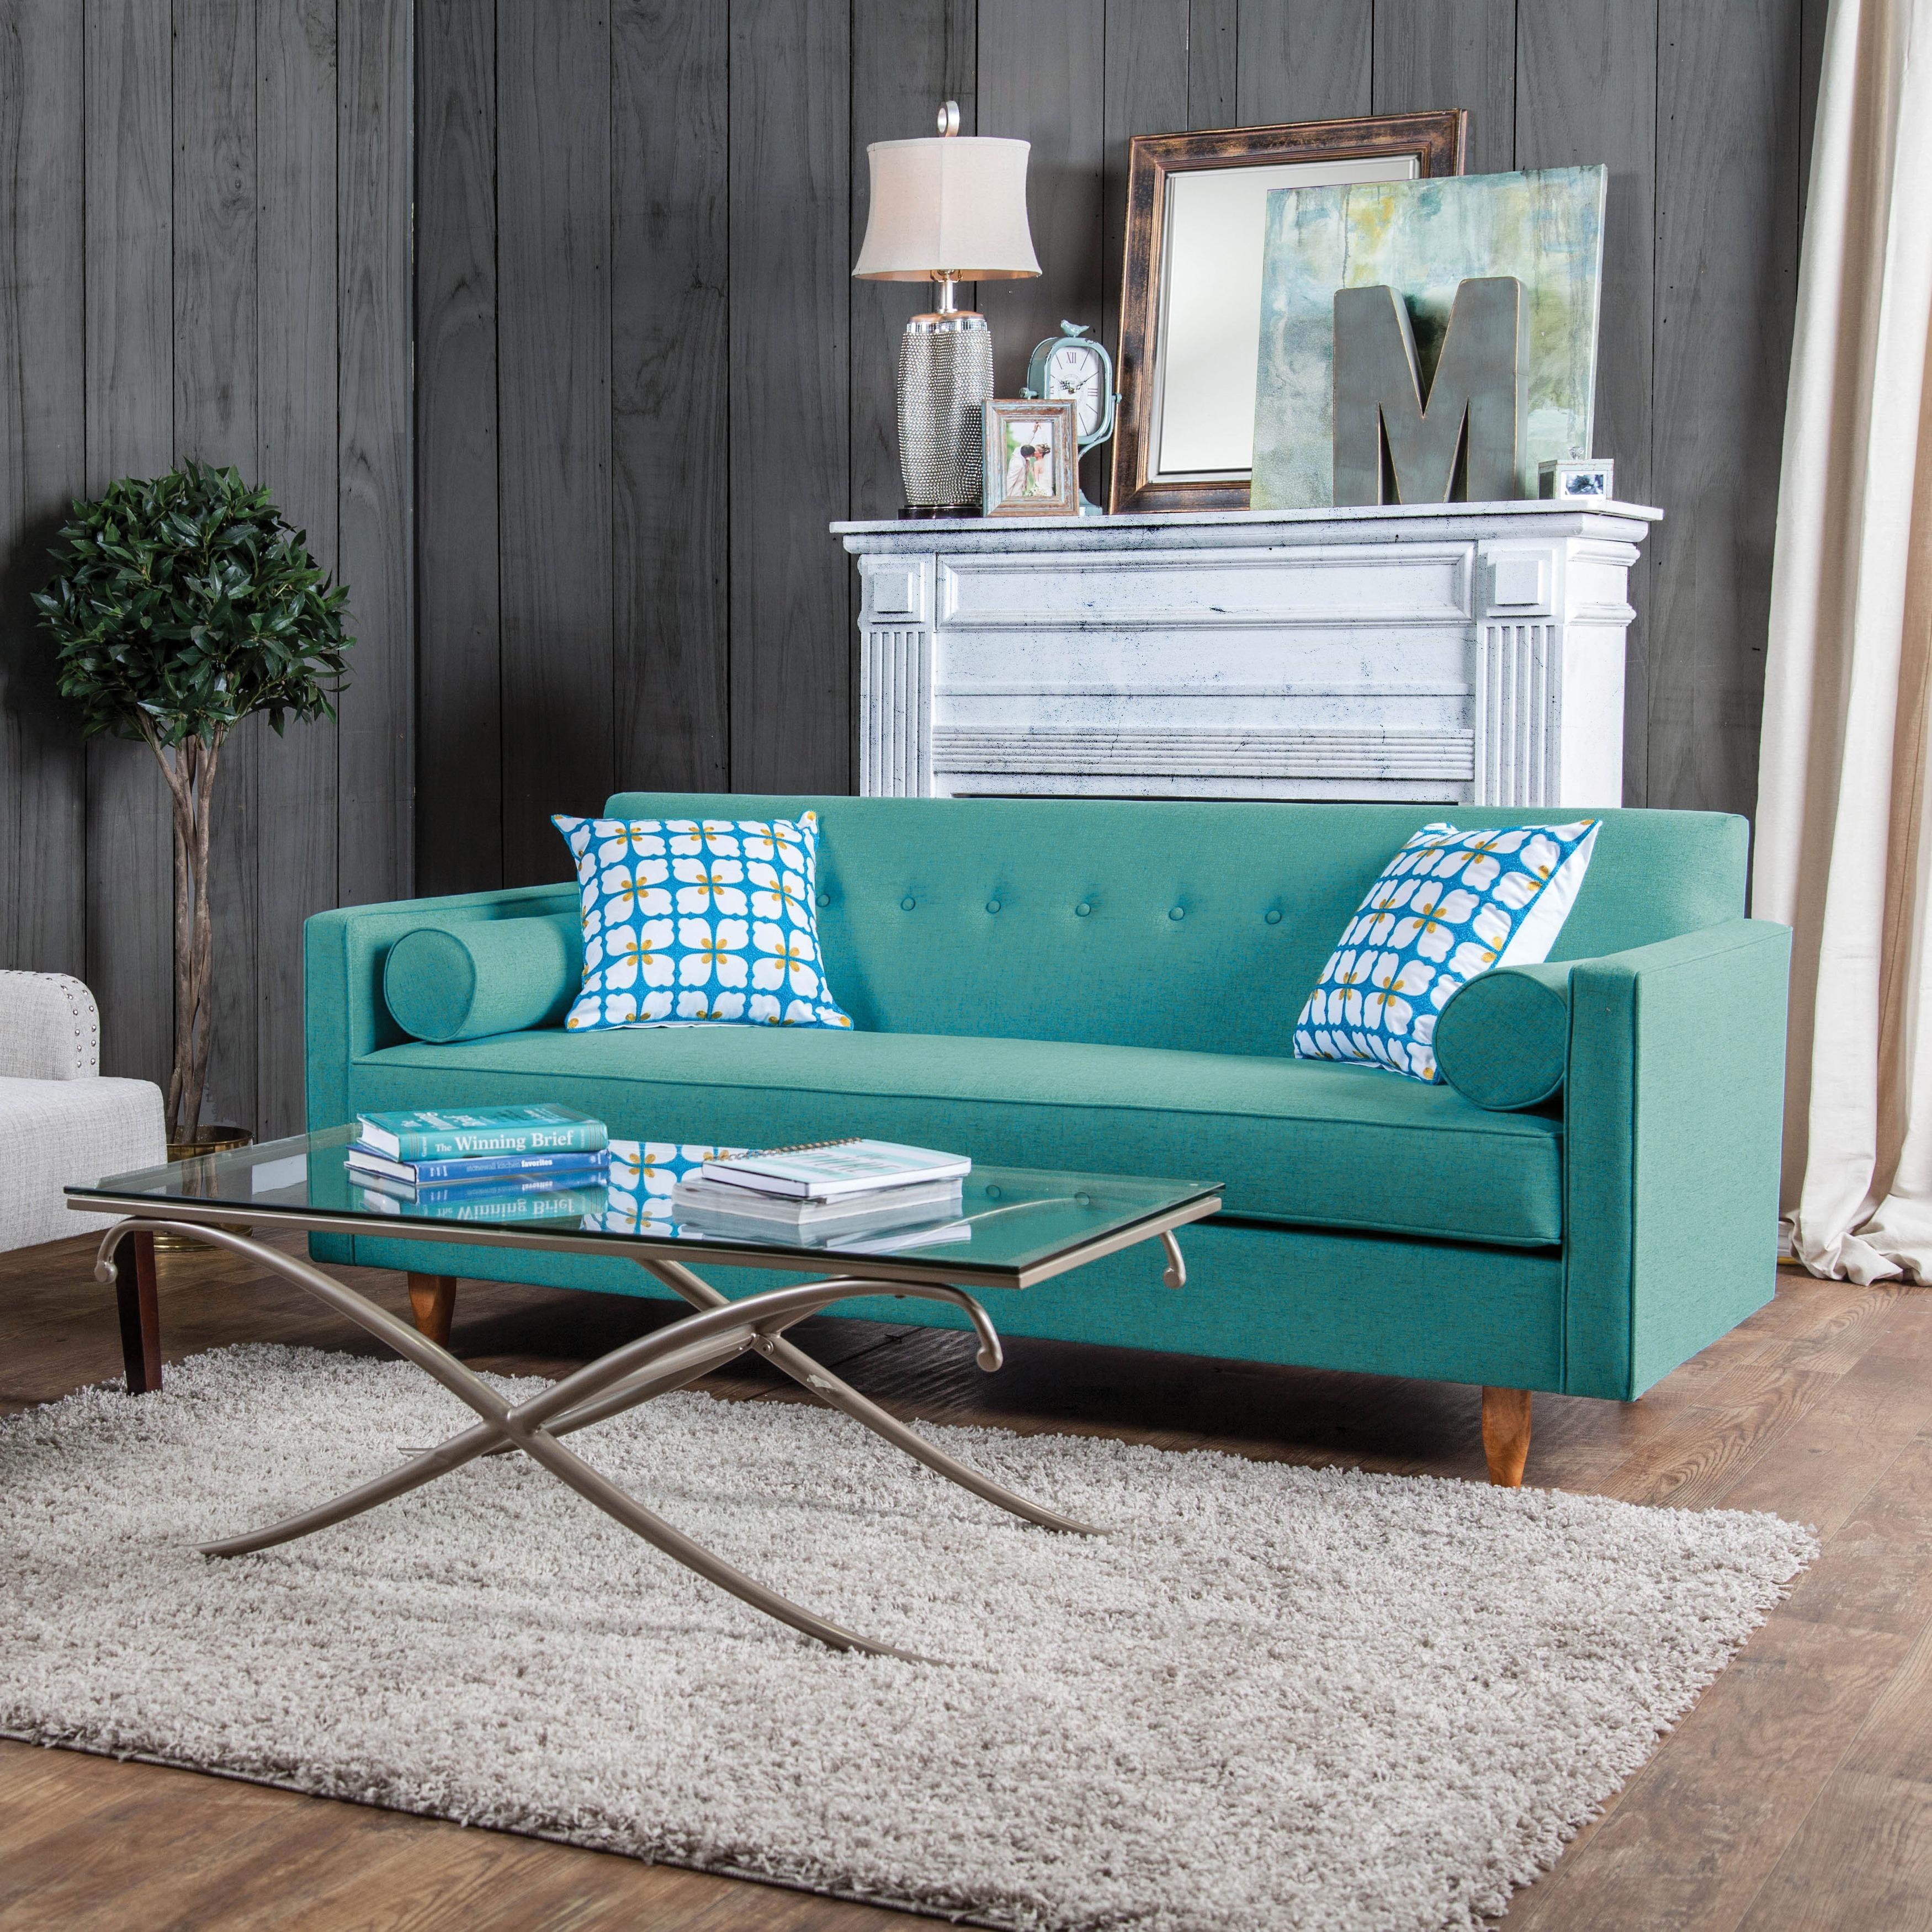 furniture of america idalia modern midcentury turquoise blue sofa  - furniture of america idalia modern midcentury turquoise blue sofa  freeshipping today  overstockcom